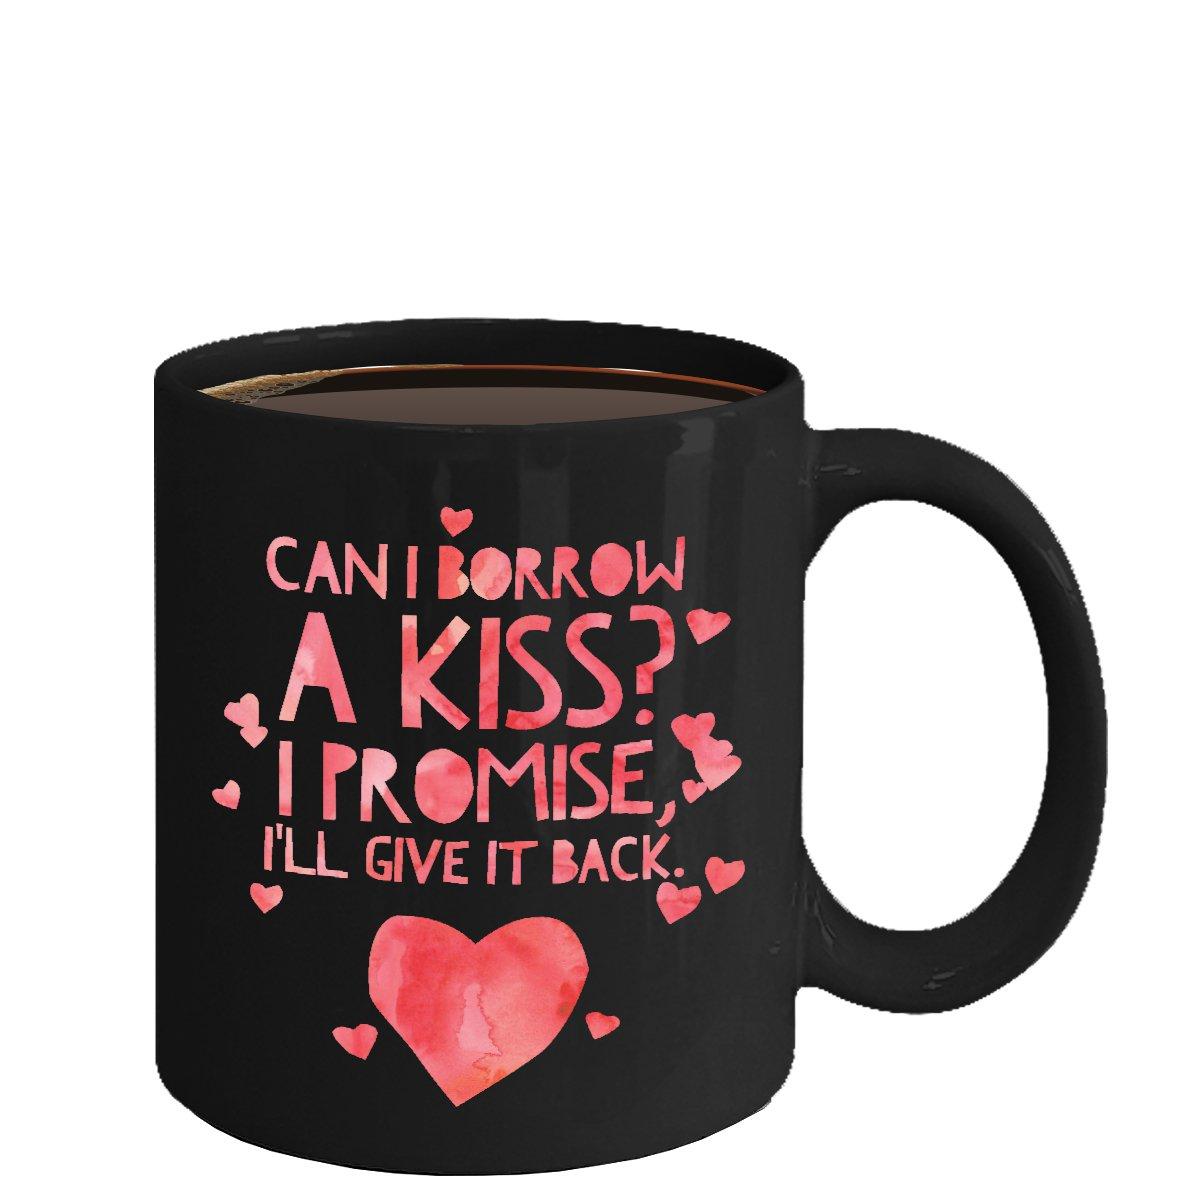 Love Ceramic Coffee Mug - Can I Borrow a Kiss - Cute Large Cup (Black) - Best Gift for Men, Women